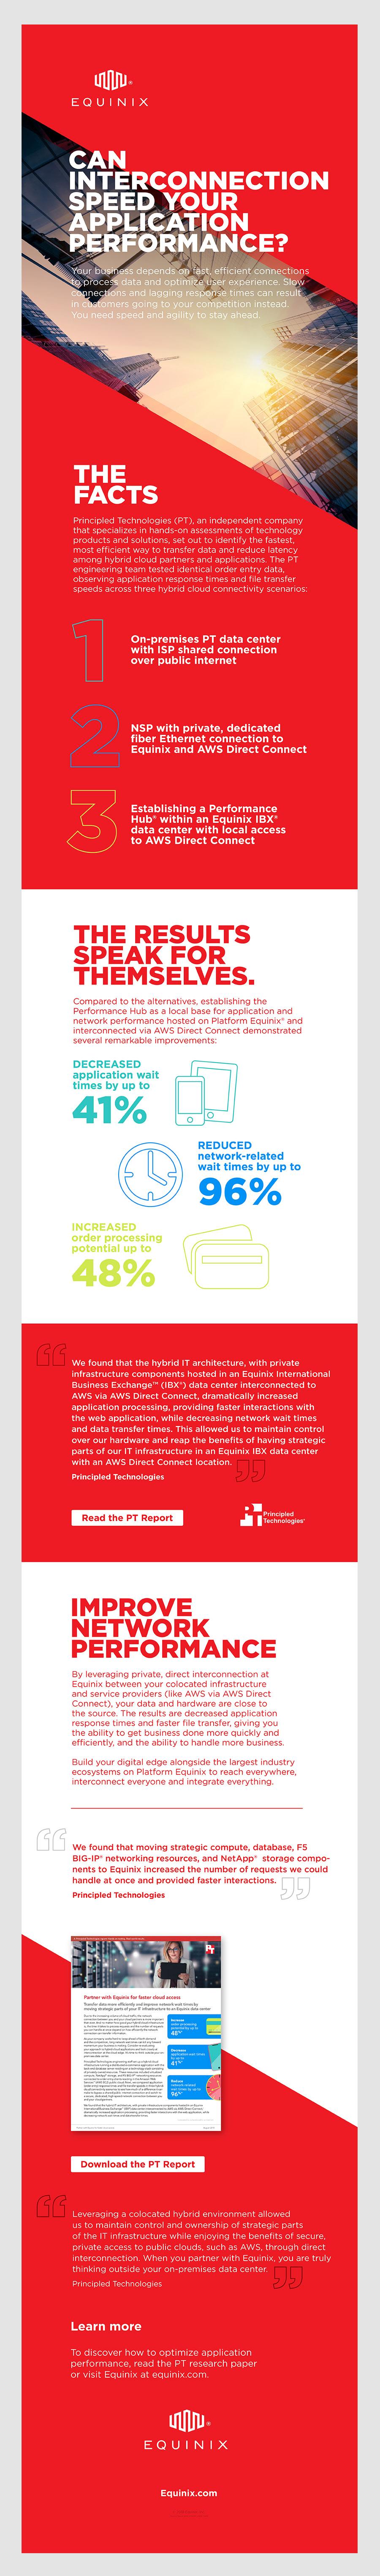 Principled Technologies Infographic.jpg